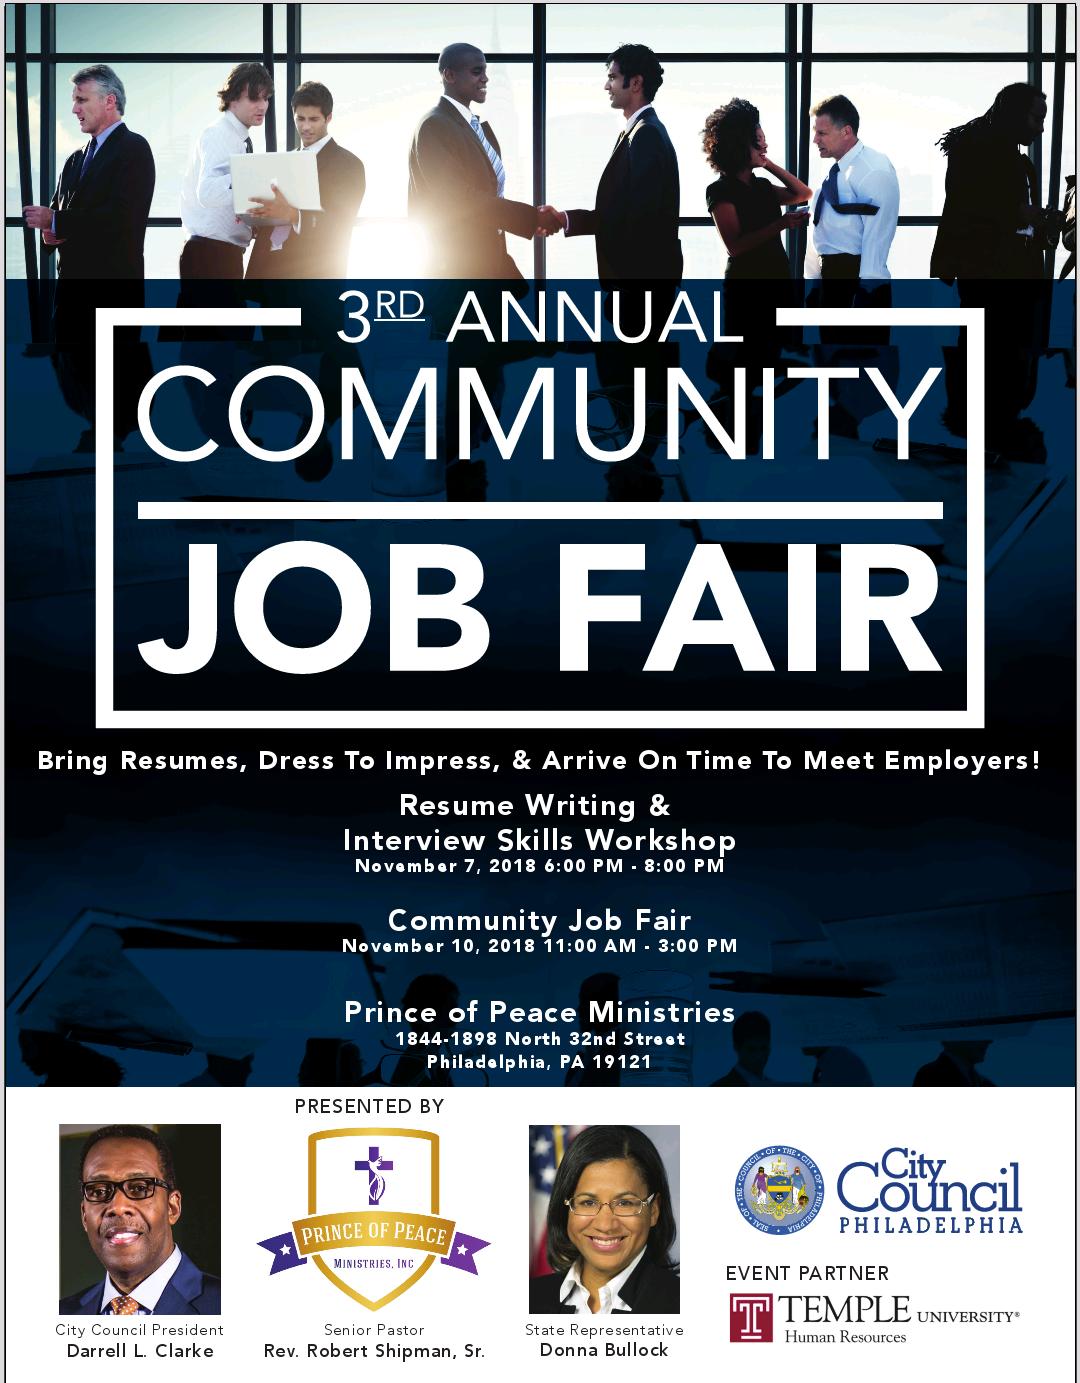 Job Fair Flyer, Nov. 10, 2018 - photo graphic.png